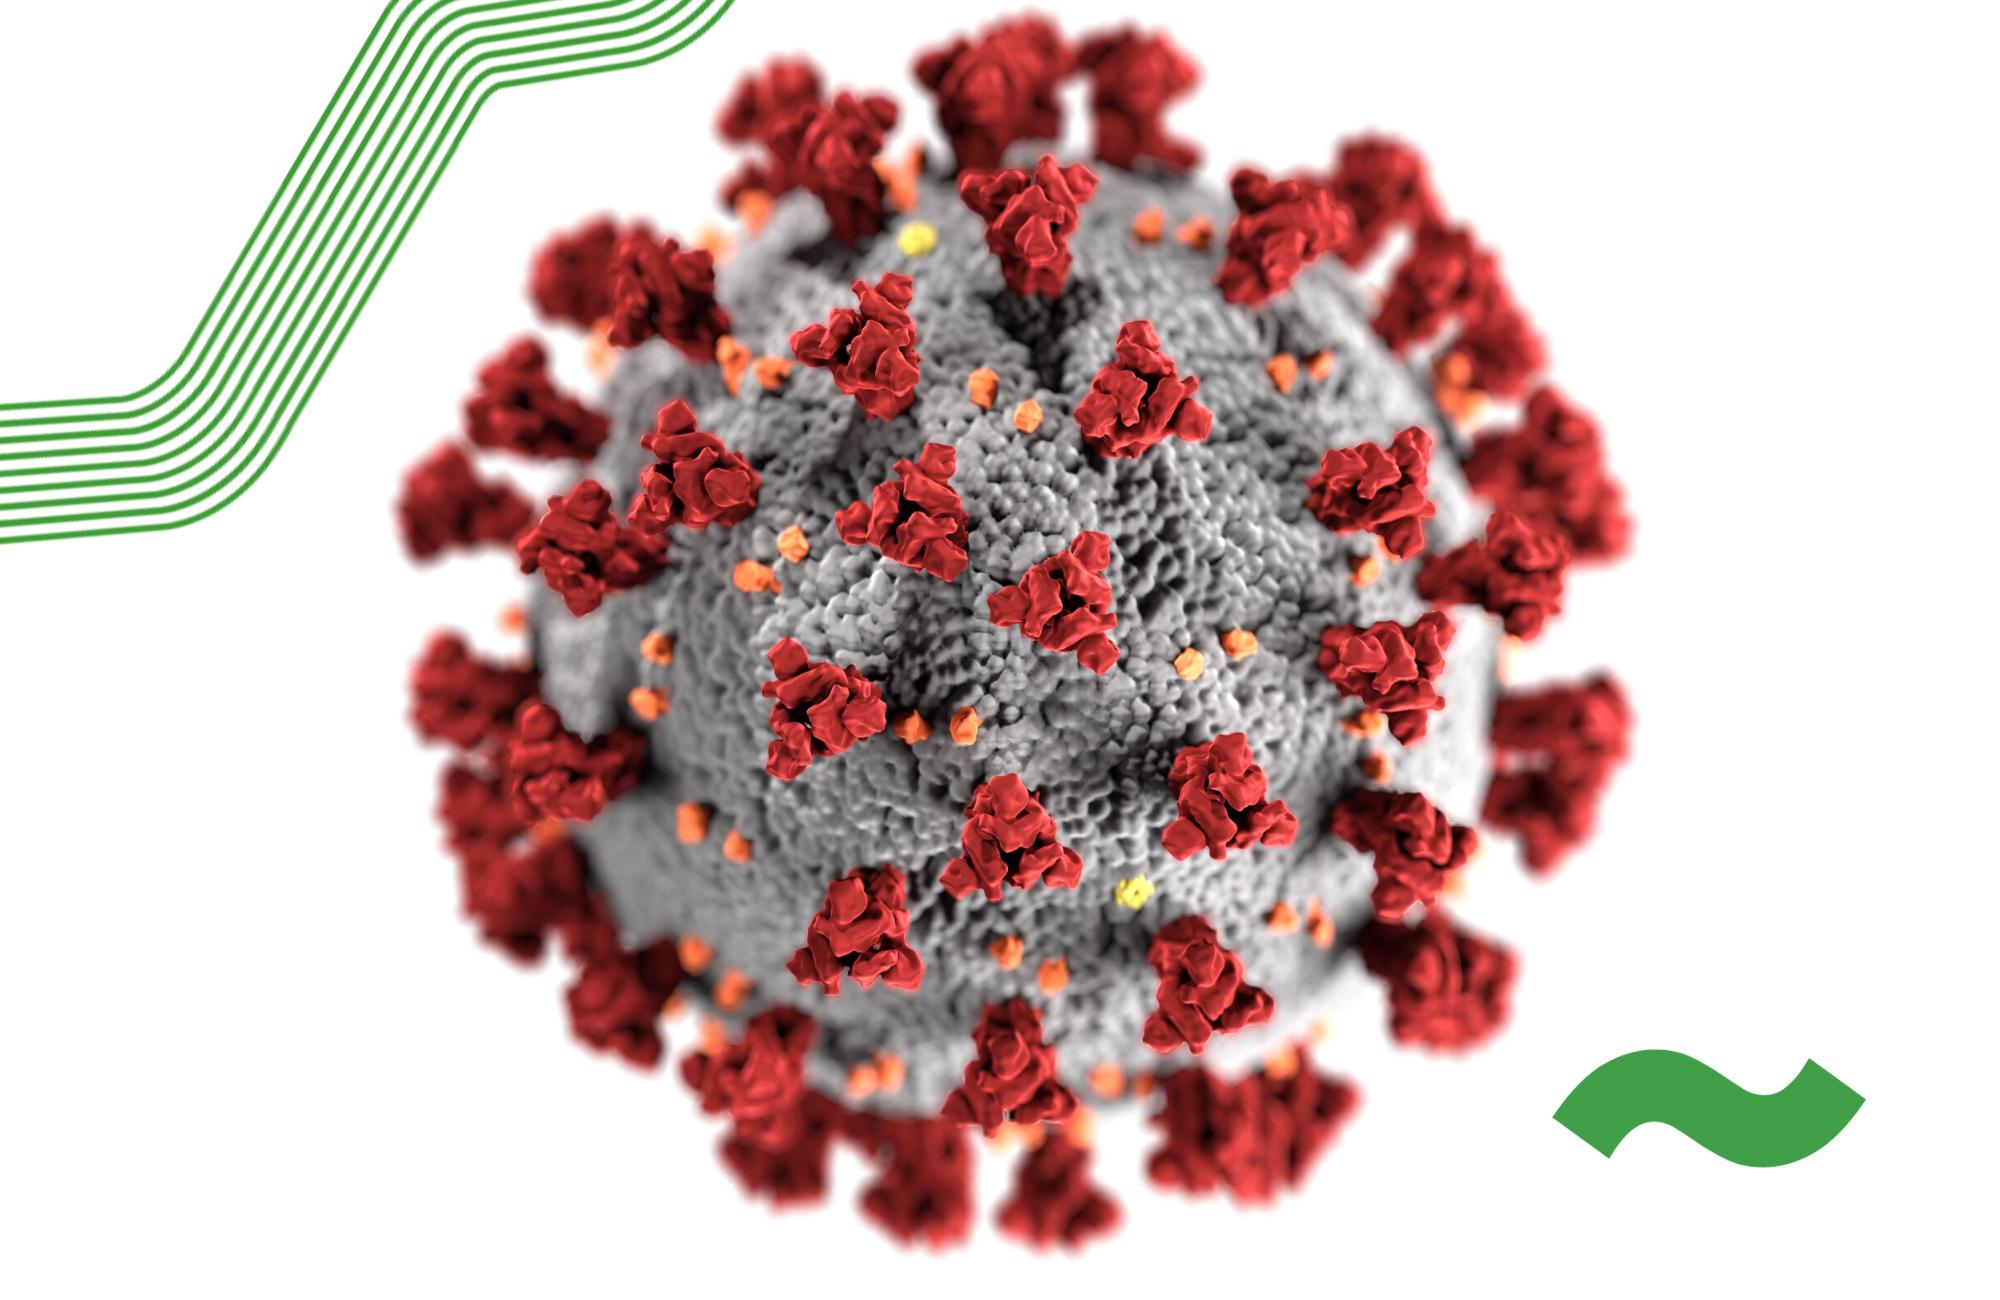 Hosting in the coronavirus era: face masks, diesel, and food supplies